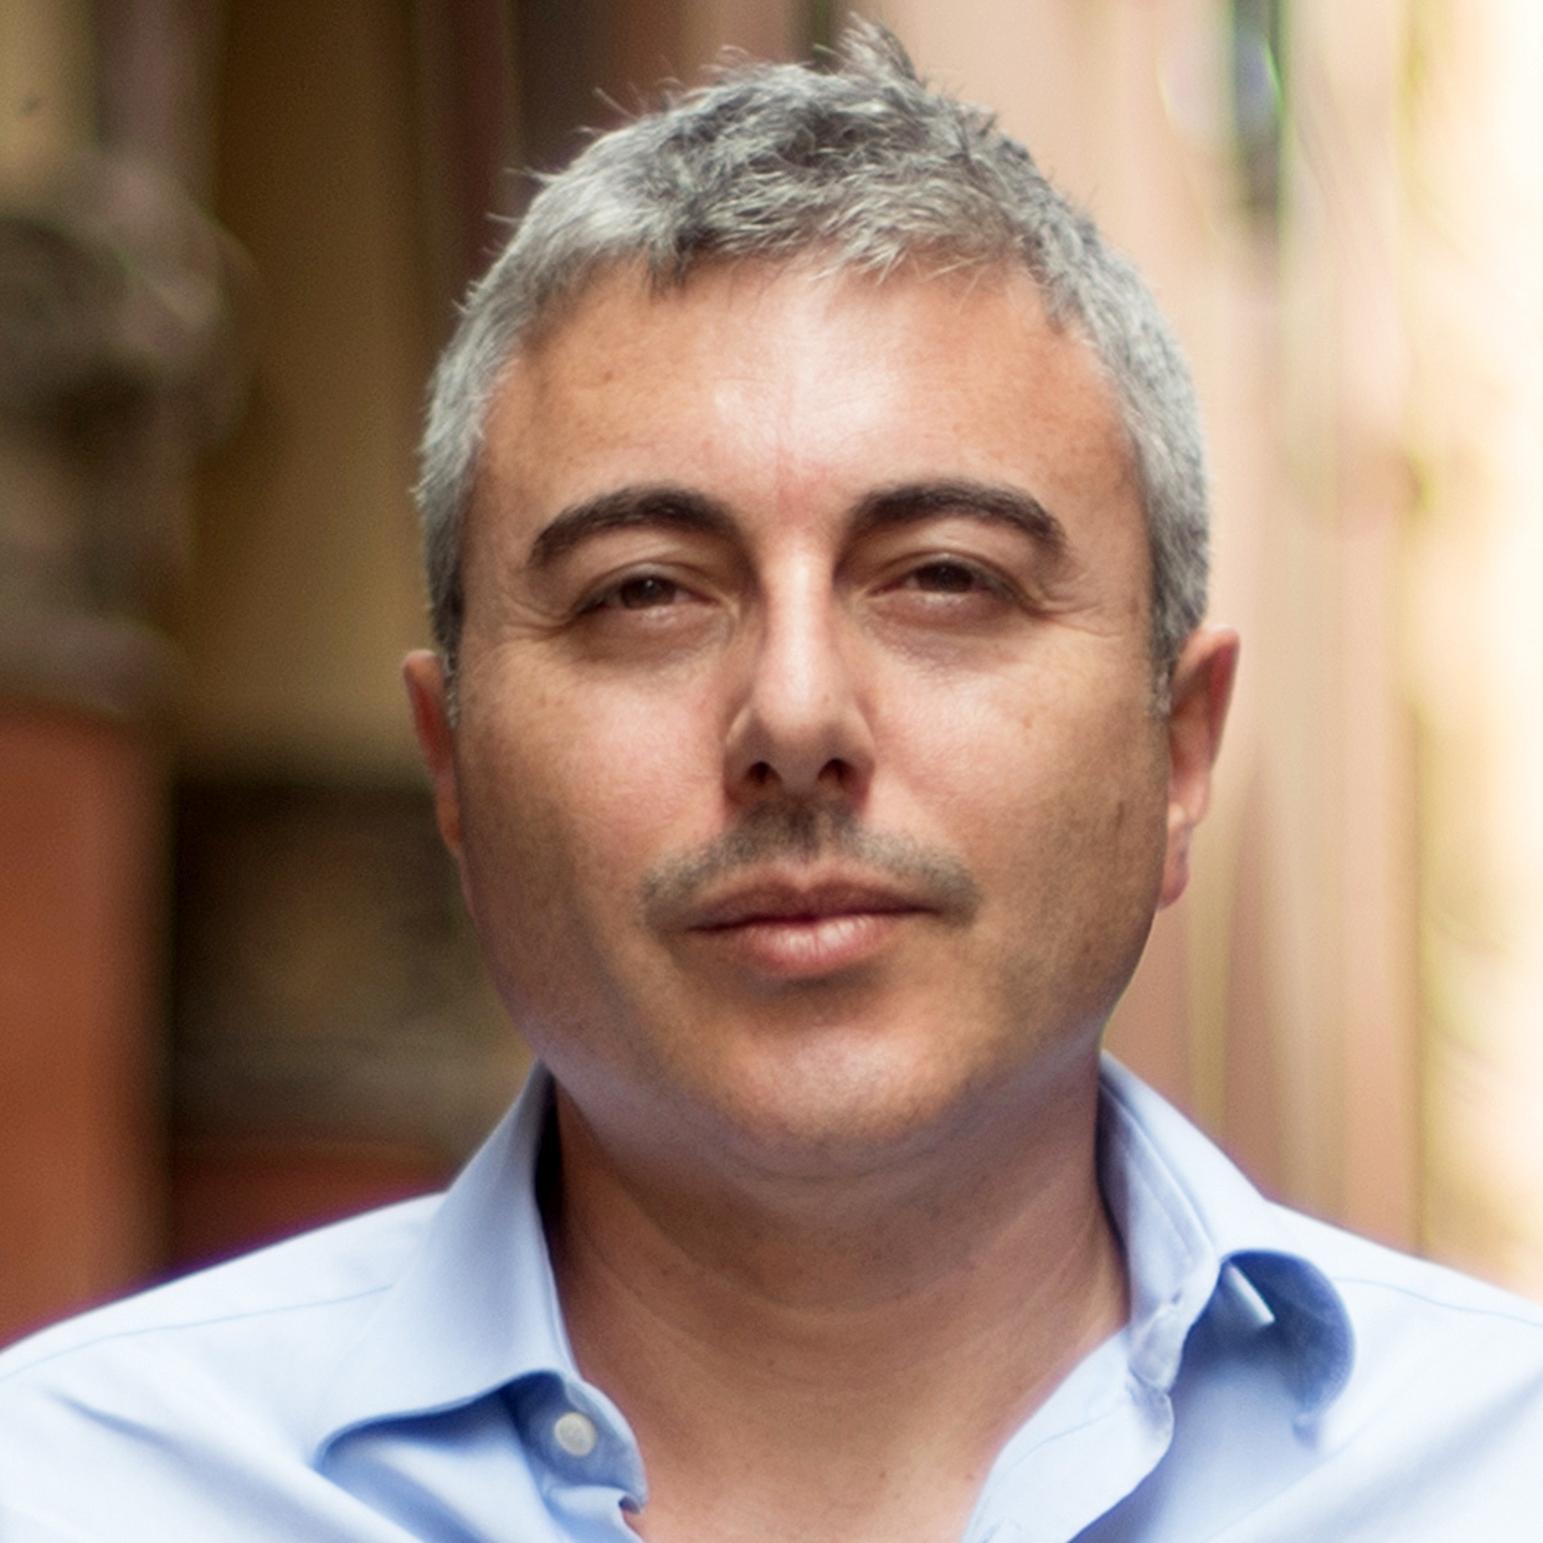 Fausto Tomei